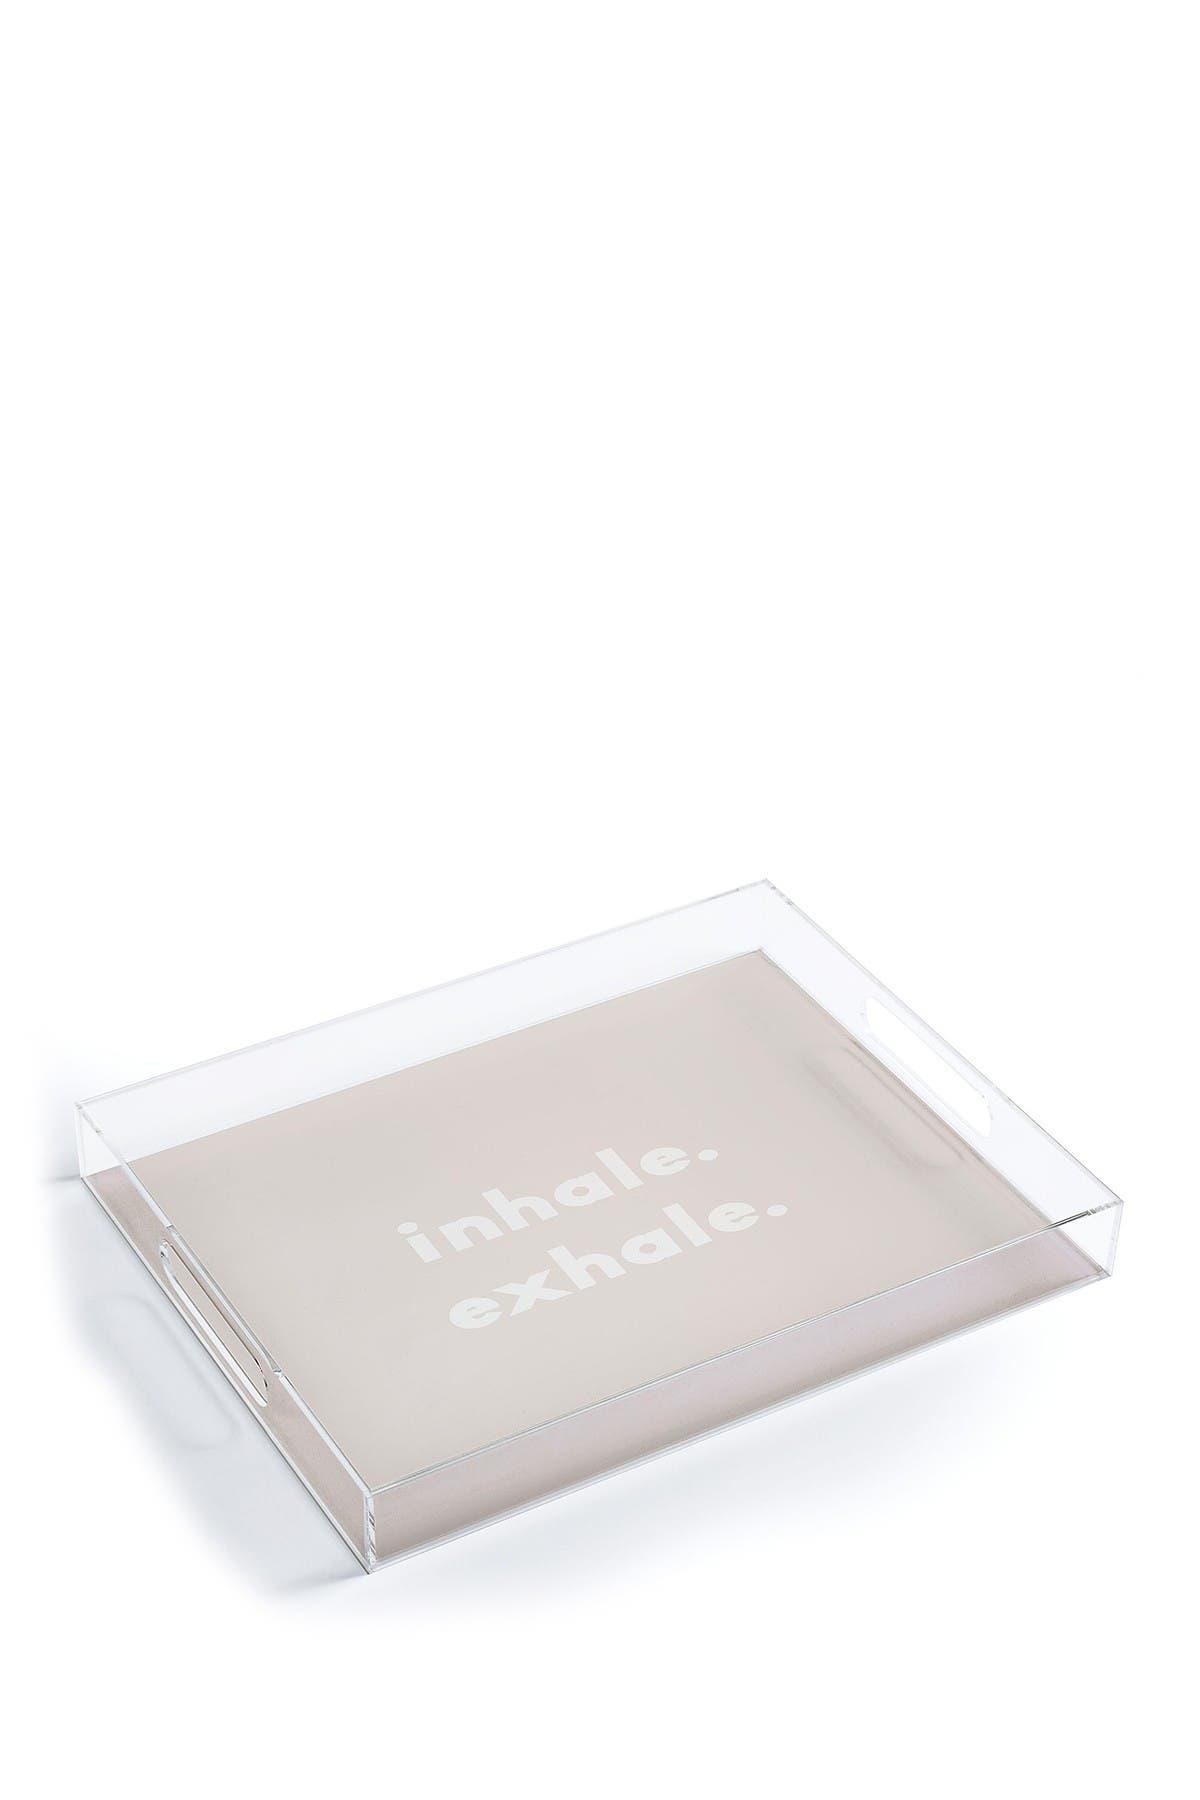 Image of Deny Designs Urban Wild Studio Inhale Exhale Blush Acrylic Tray